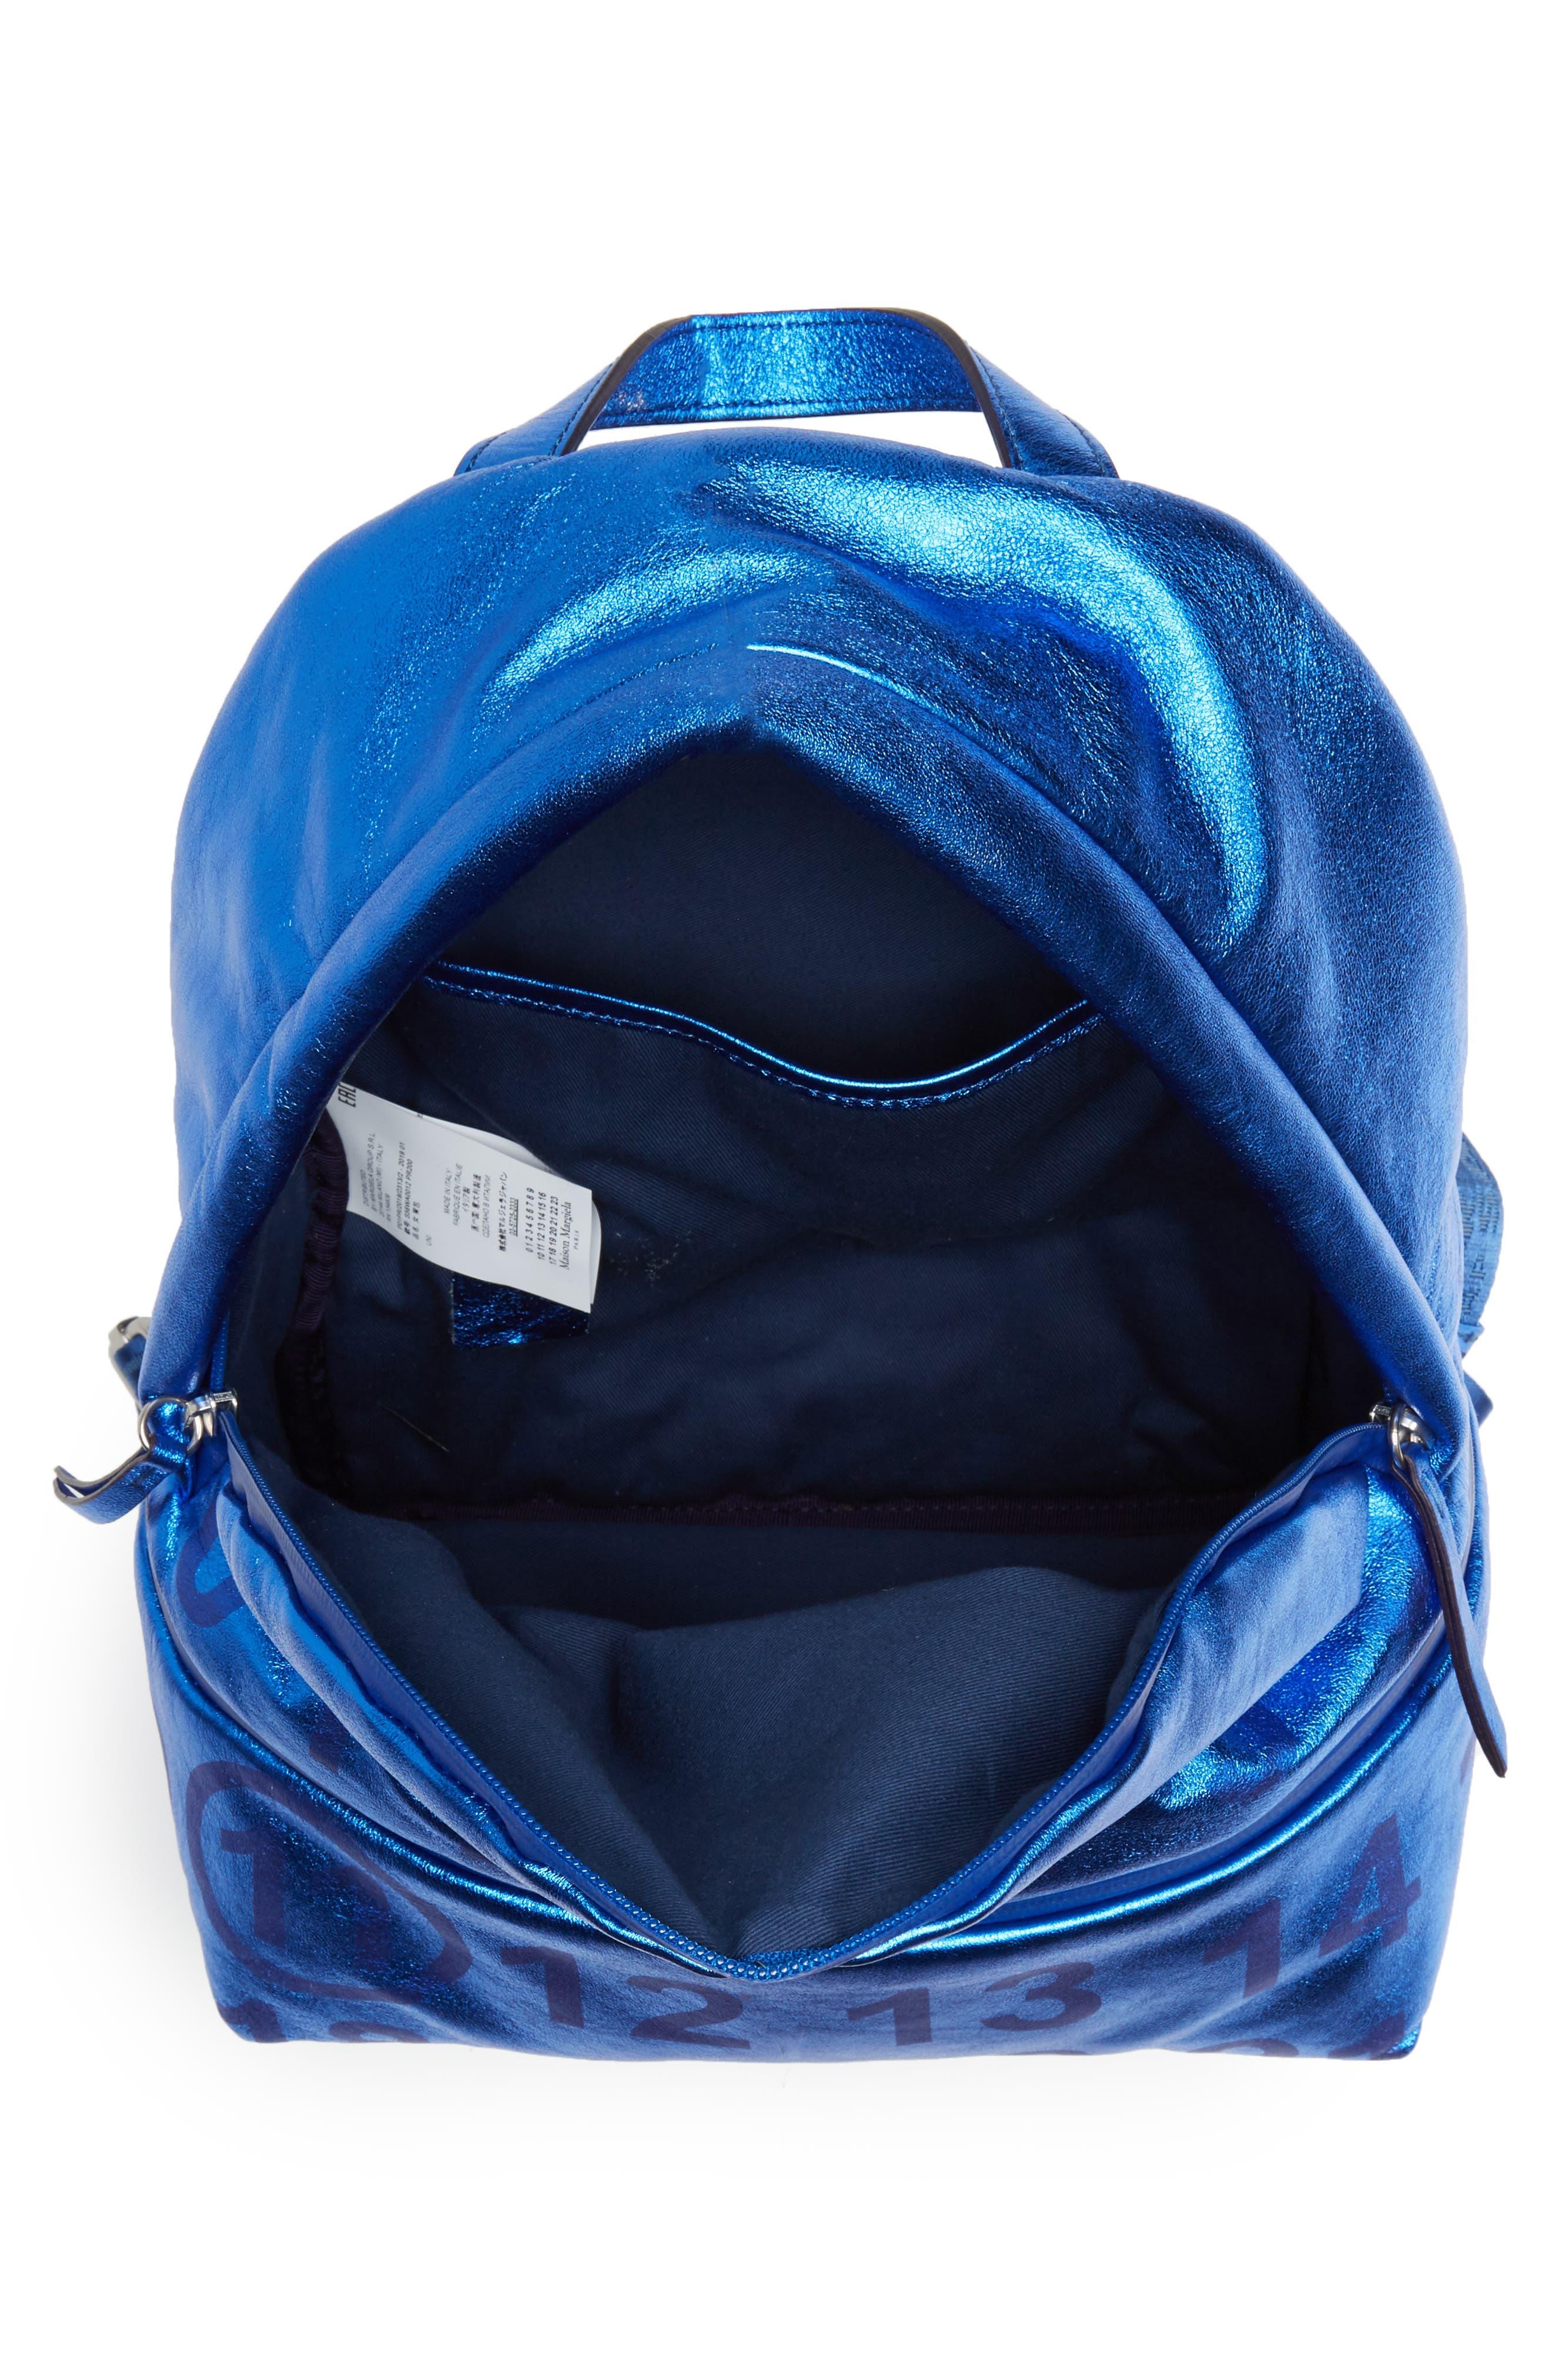 MAISON MARGIELA,                             Medium Number Print Backpack,                             Alternate thumbnail 4, color,                             DAZZLING BLUE